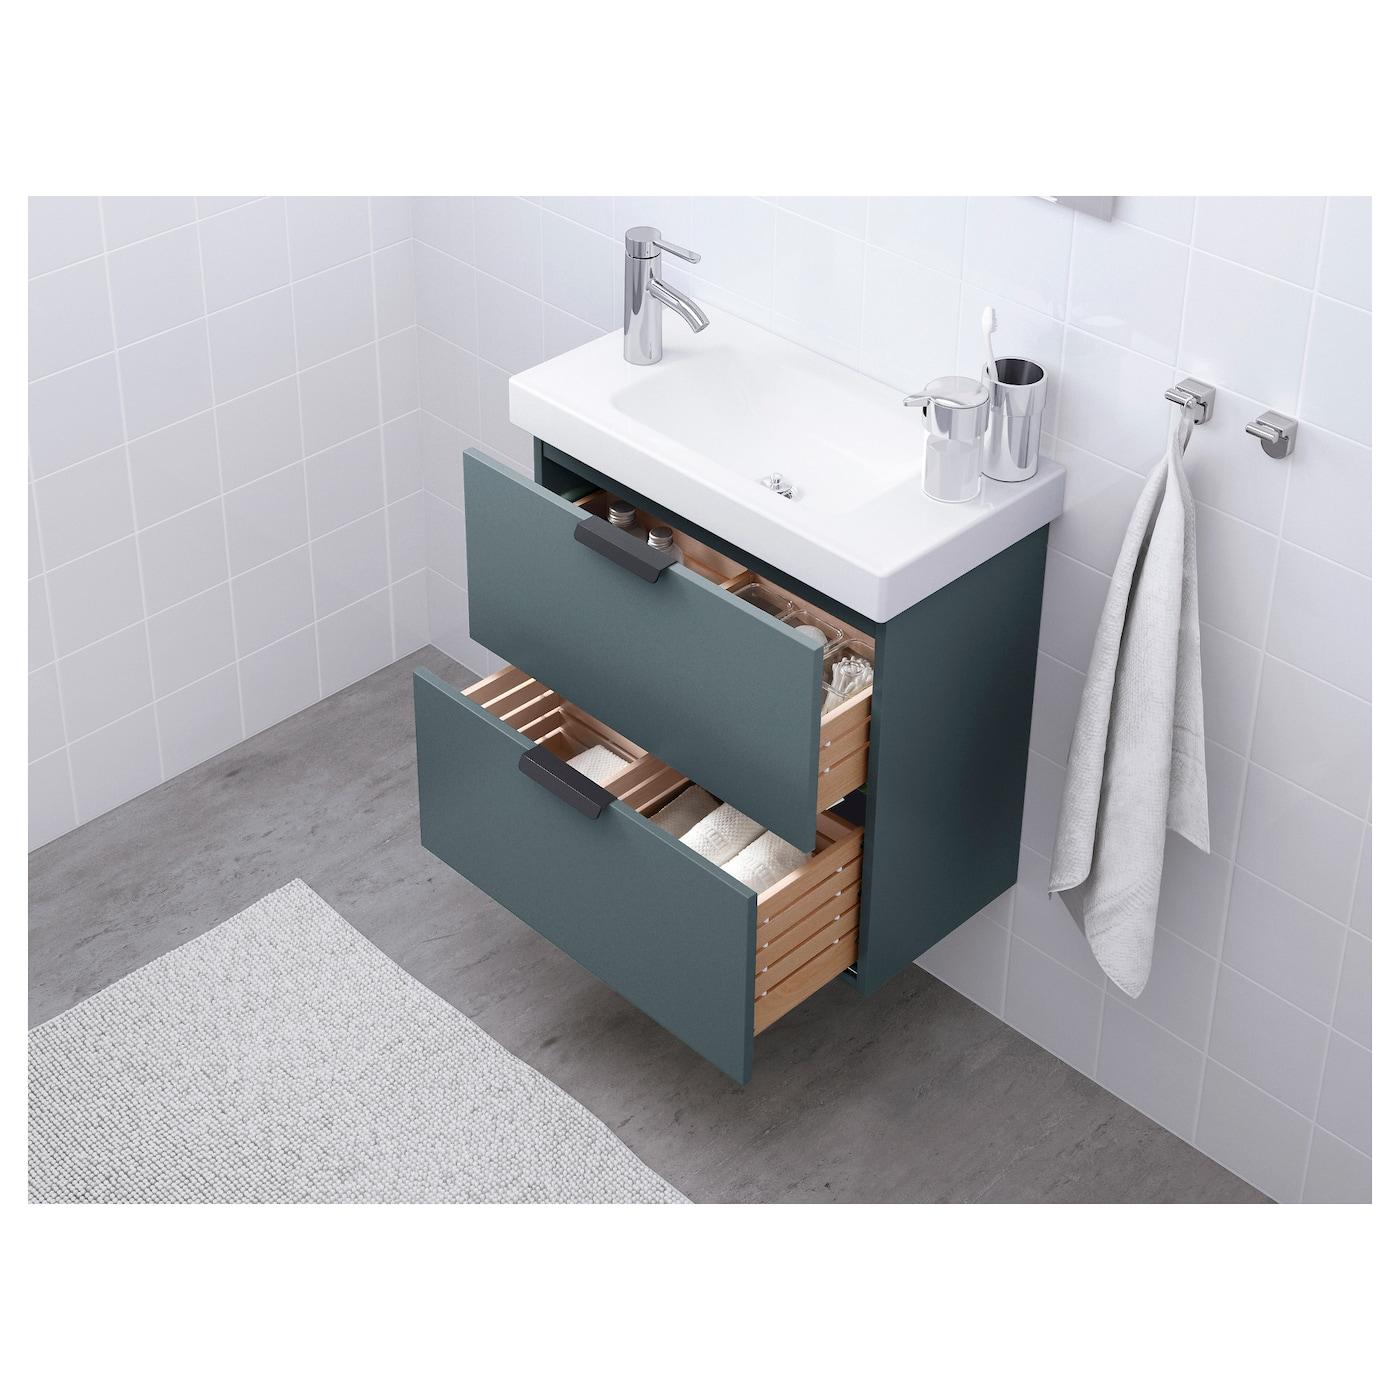 Godmorgon meuble lavabo 2tir gris turquoise 60x32x58 cm ikea for Meubles lavabo ikea